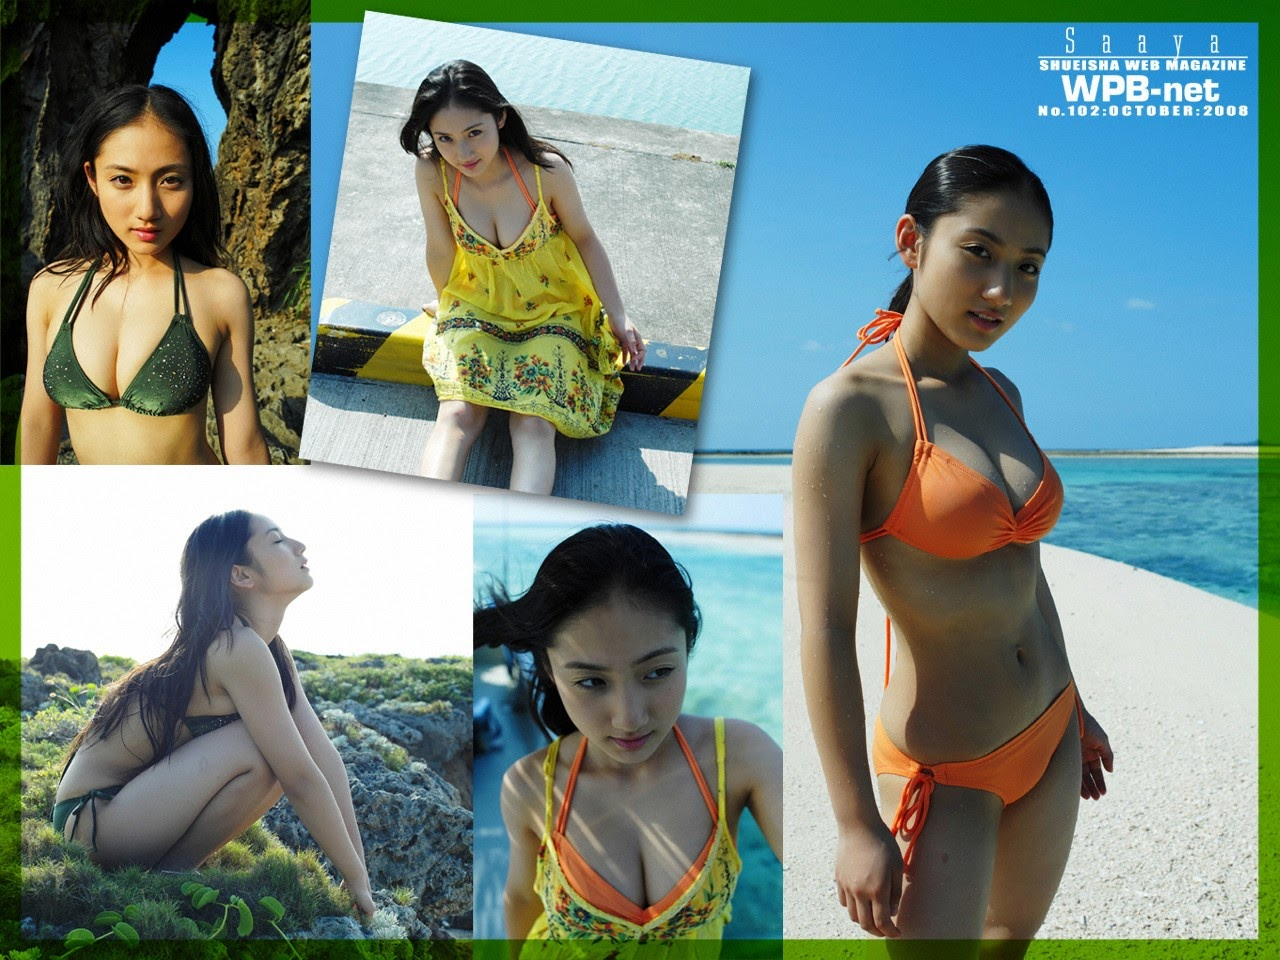 And on Kumejima the first experienceher late summer vacation begins! Saaya021